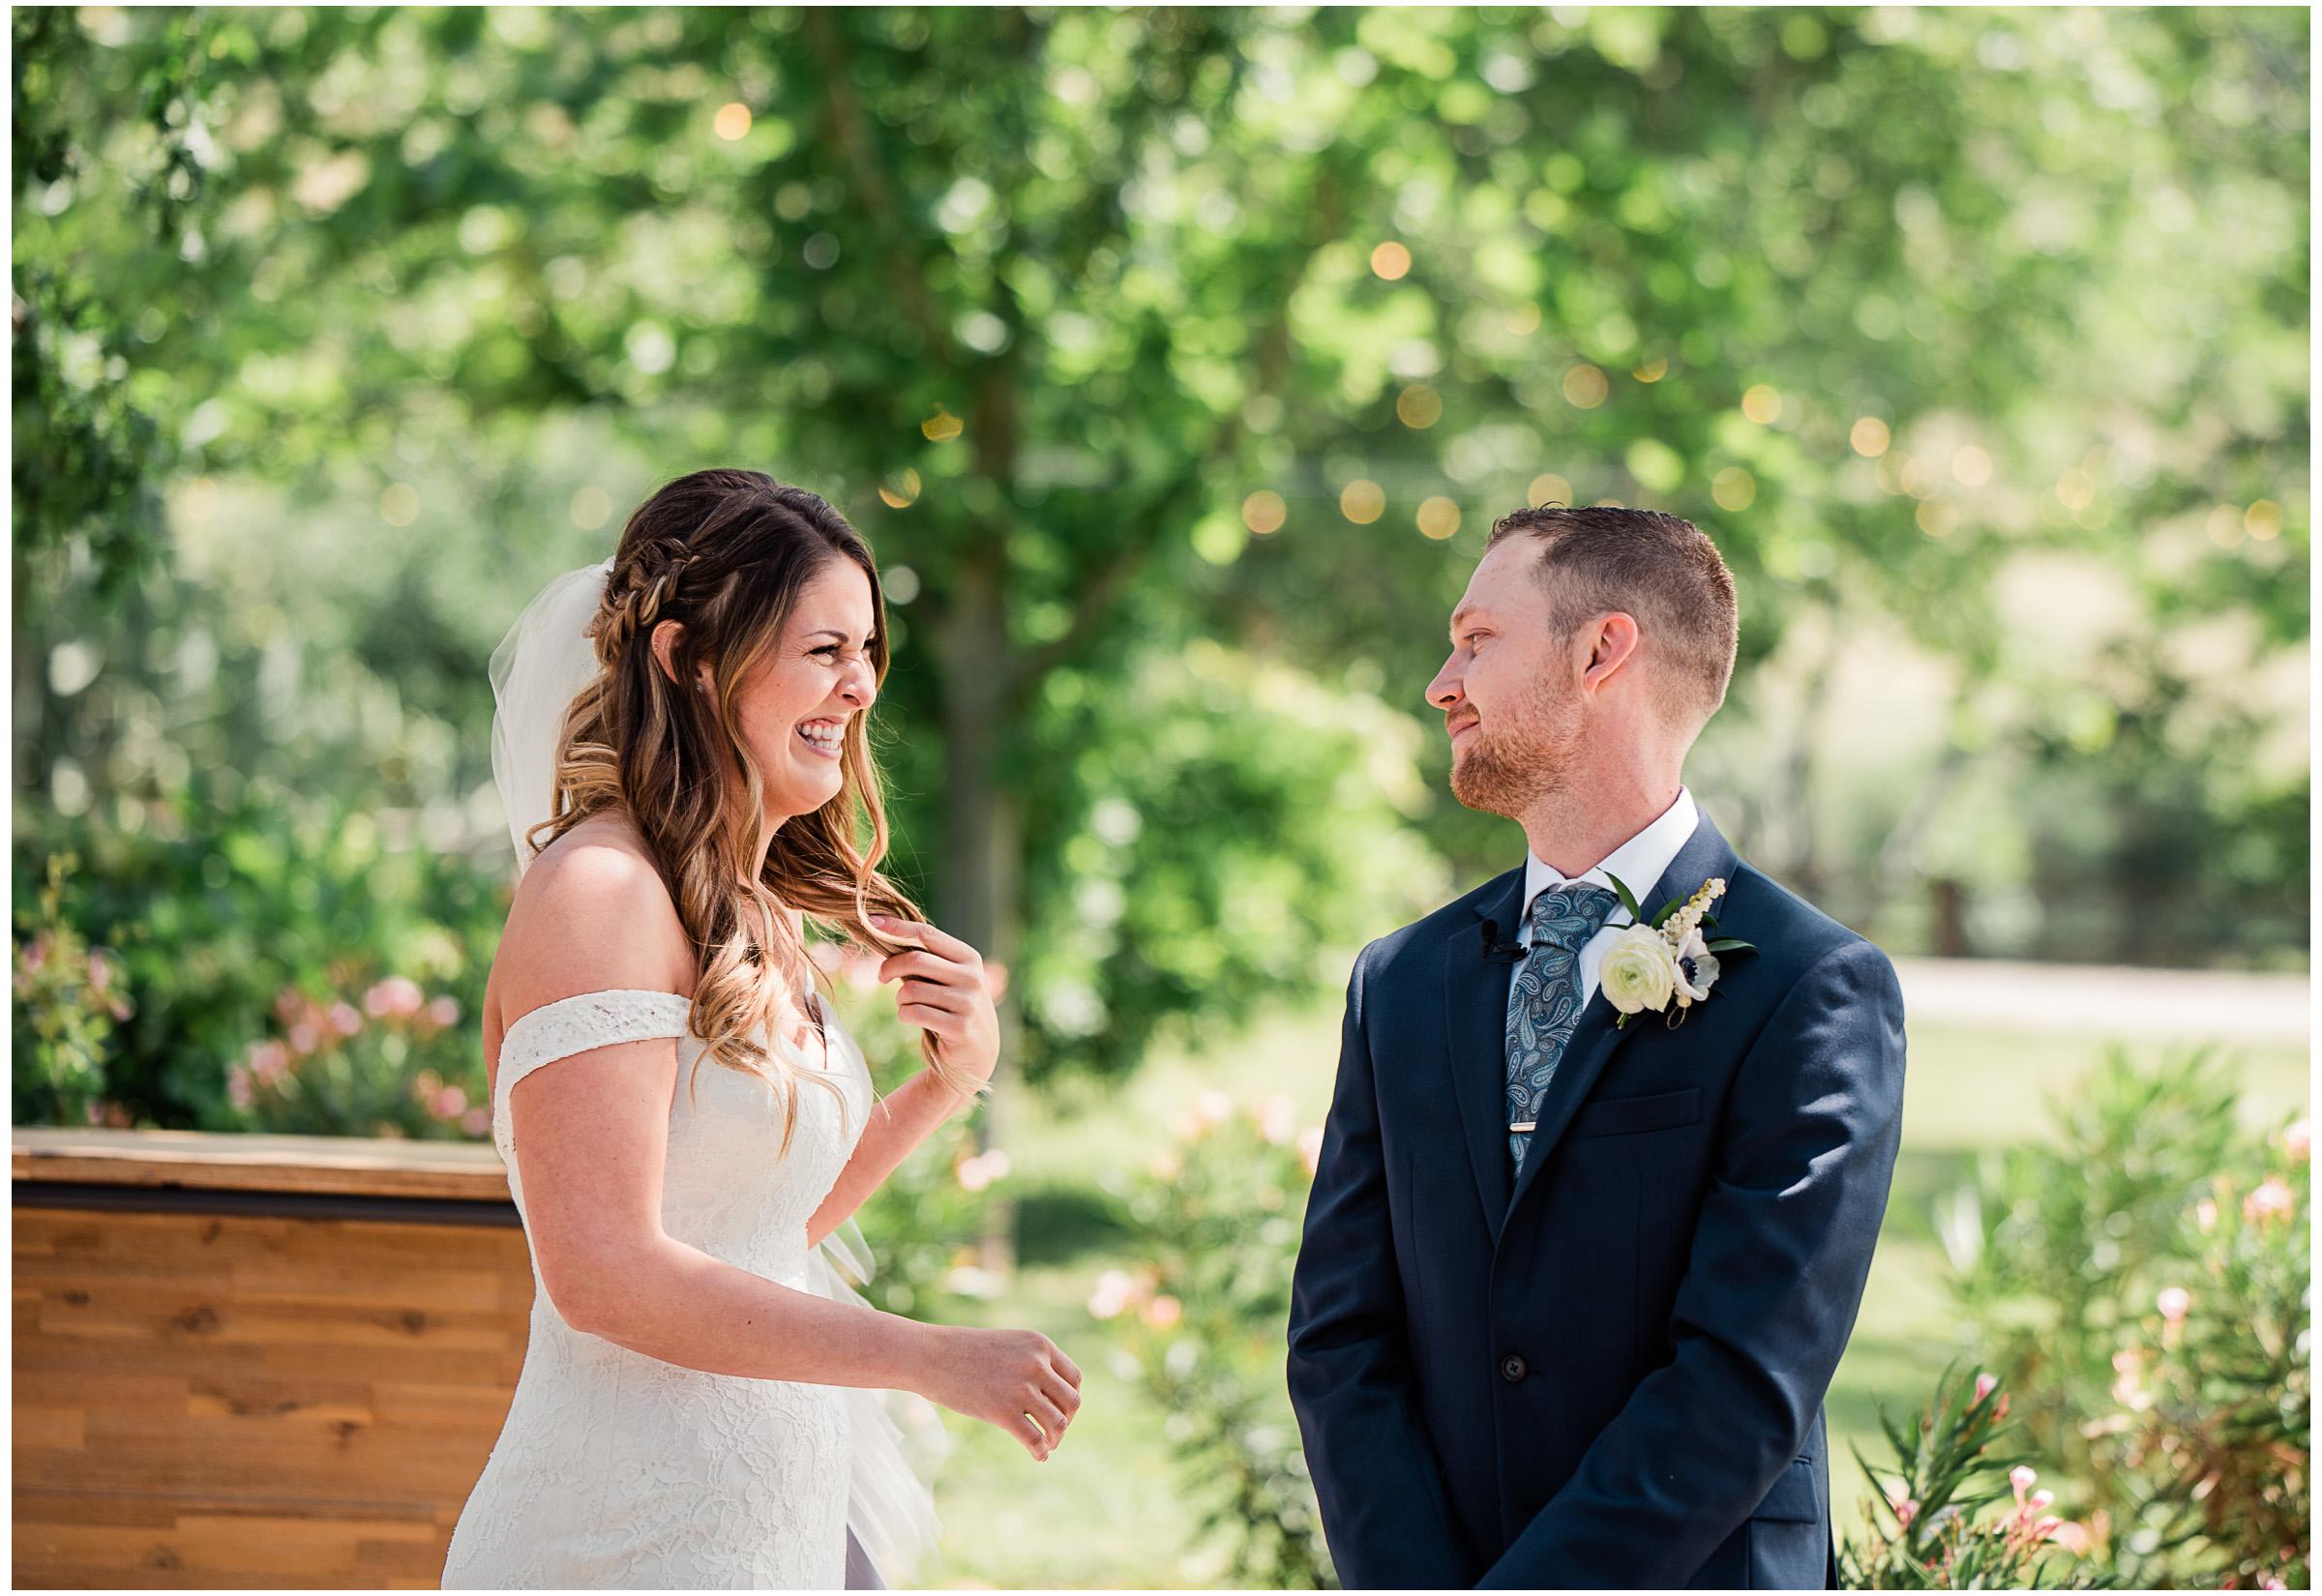 Winters Wedding - Sacramento Photographer - Field & Pond - Justin Wilcox Photography - 11.jpg